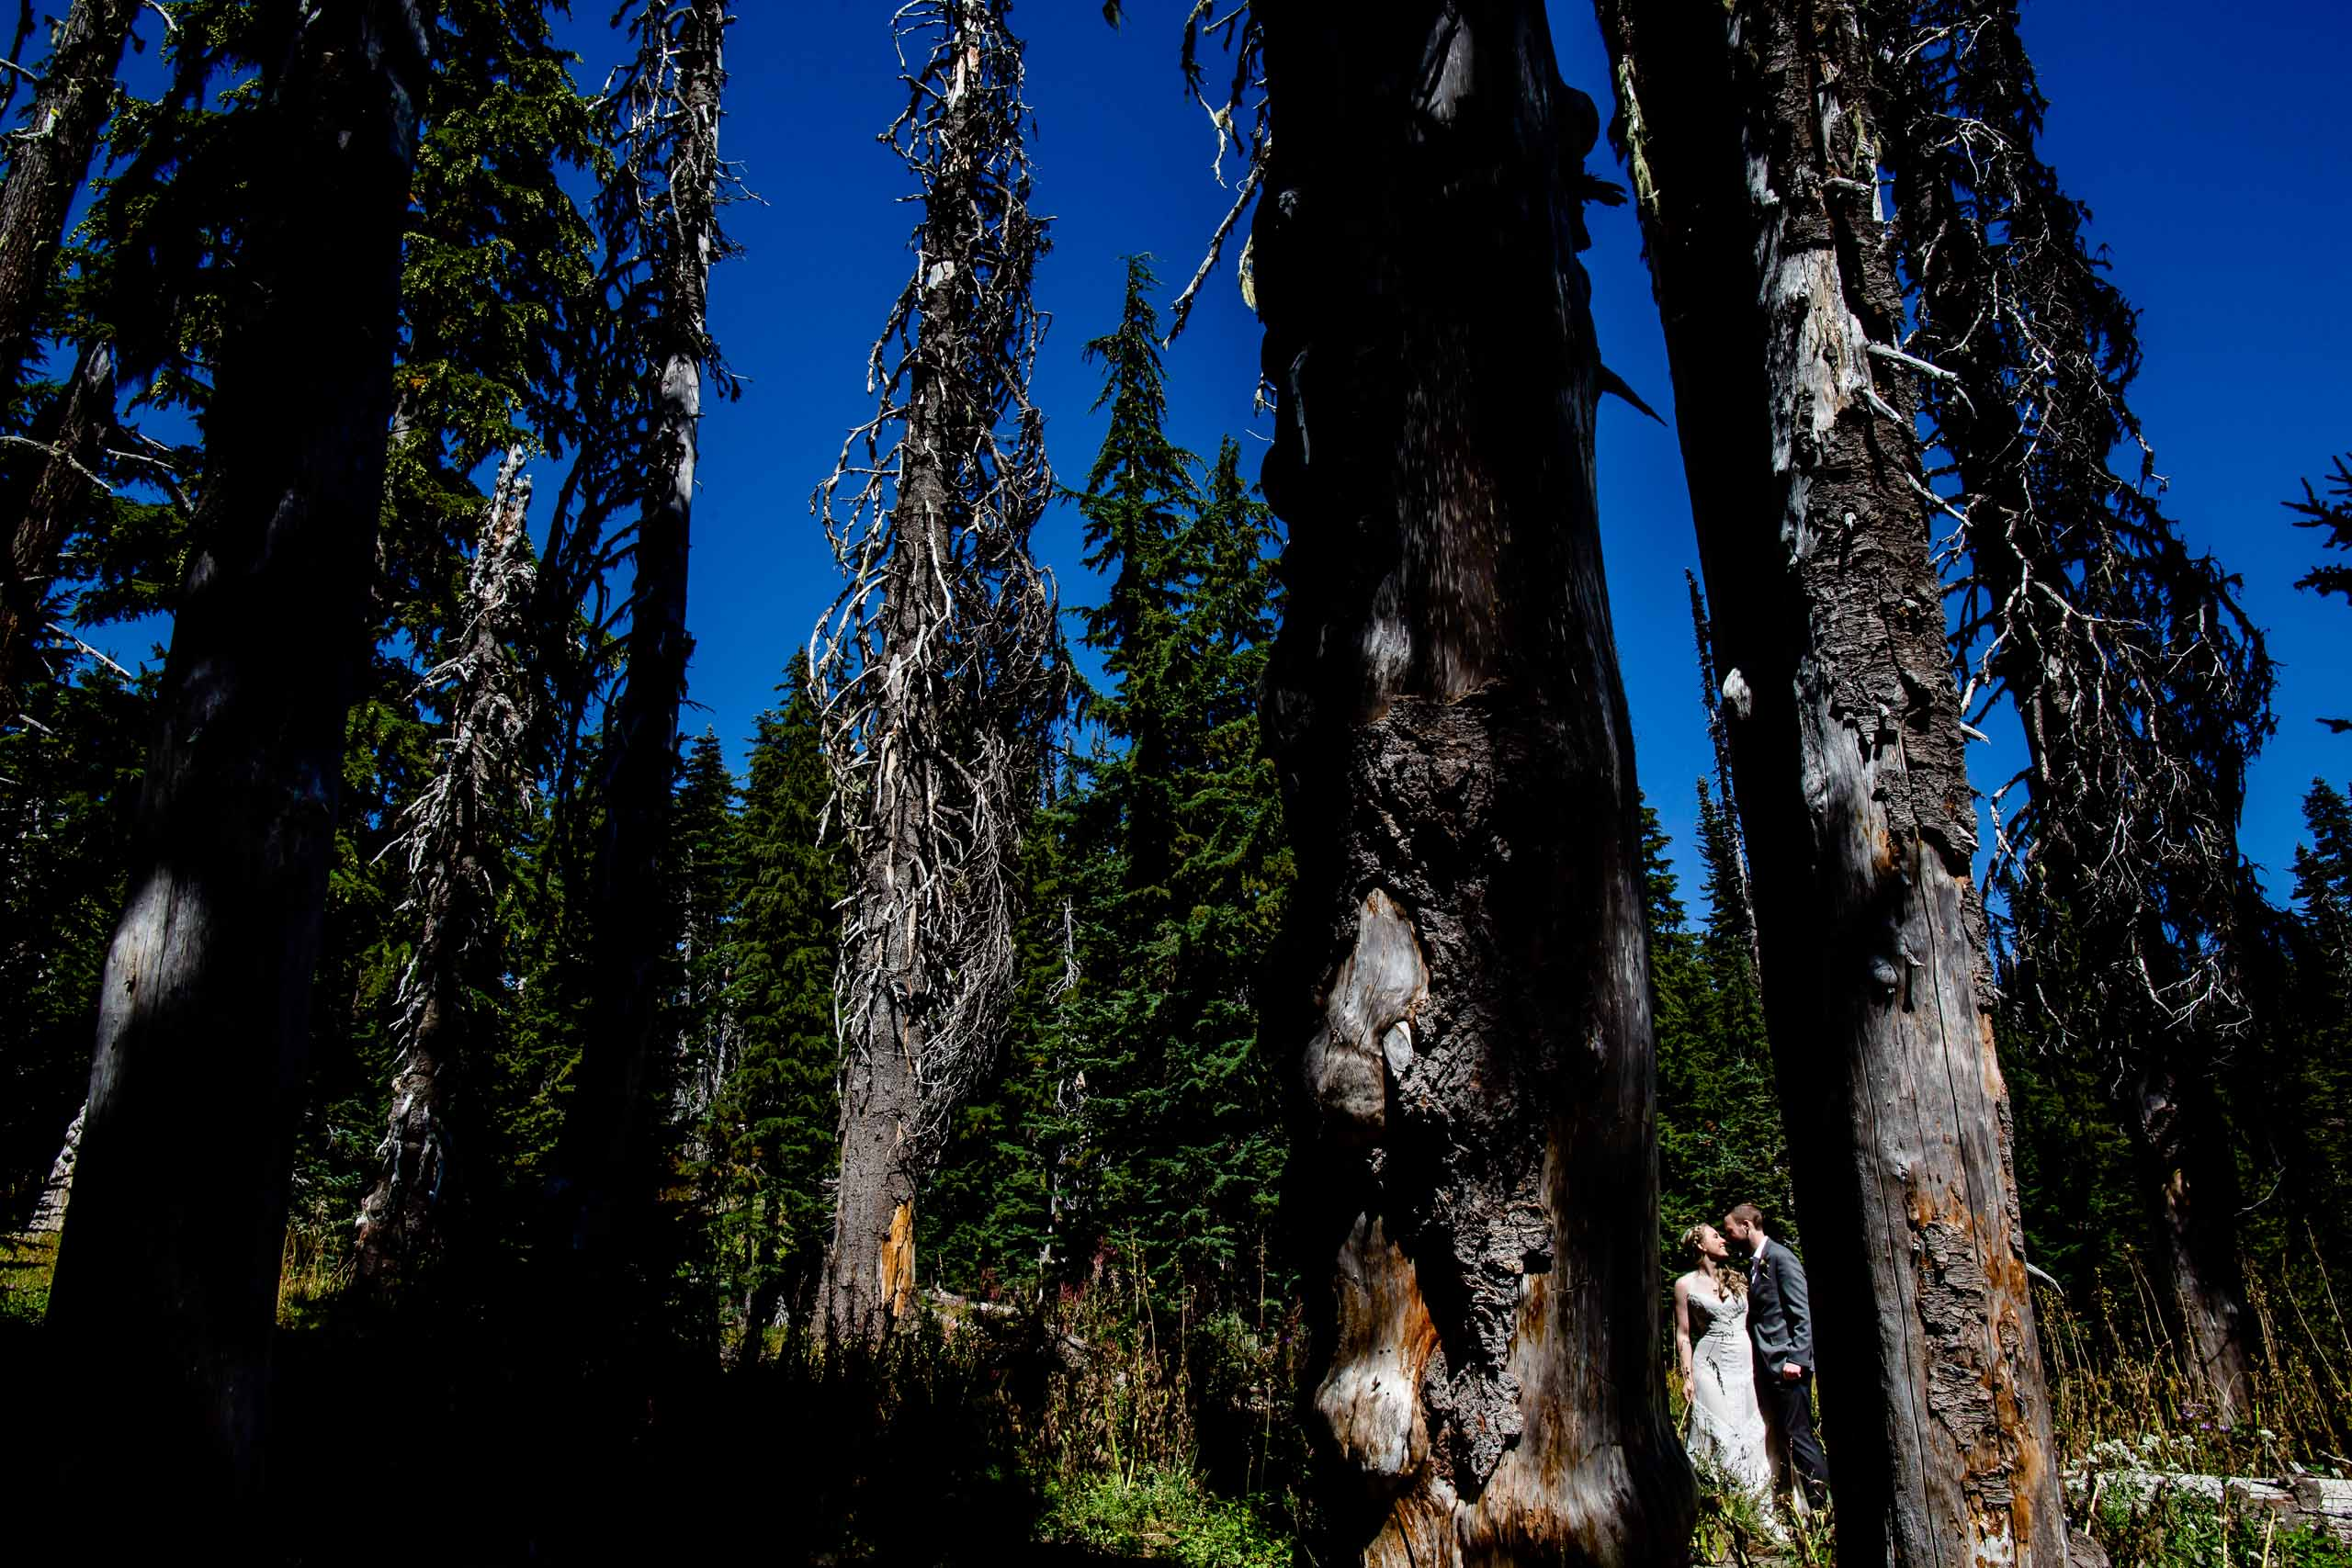 Bride and groom walking through deep nature at their Mt Hood Meadows wedding at Umbrella Falls